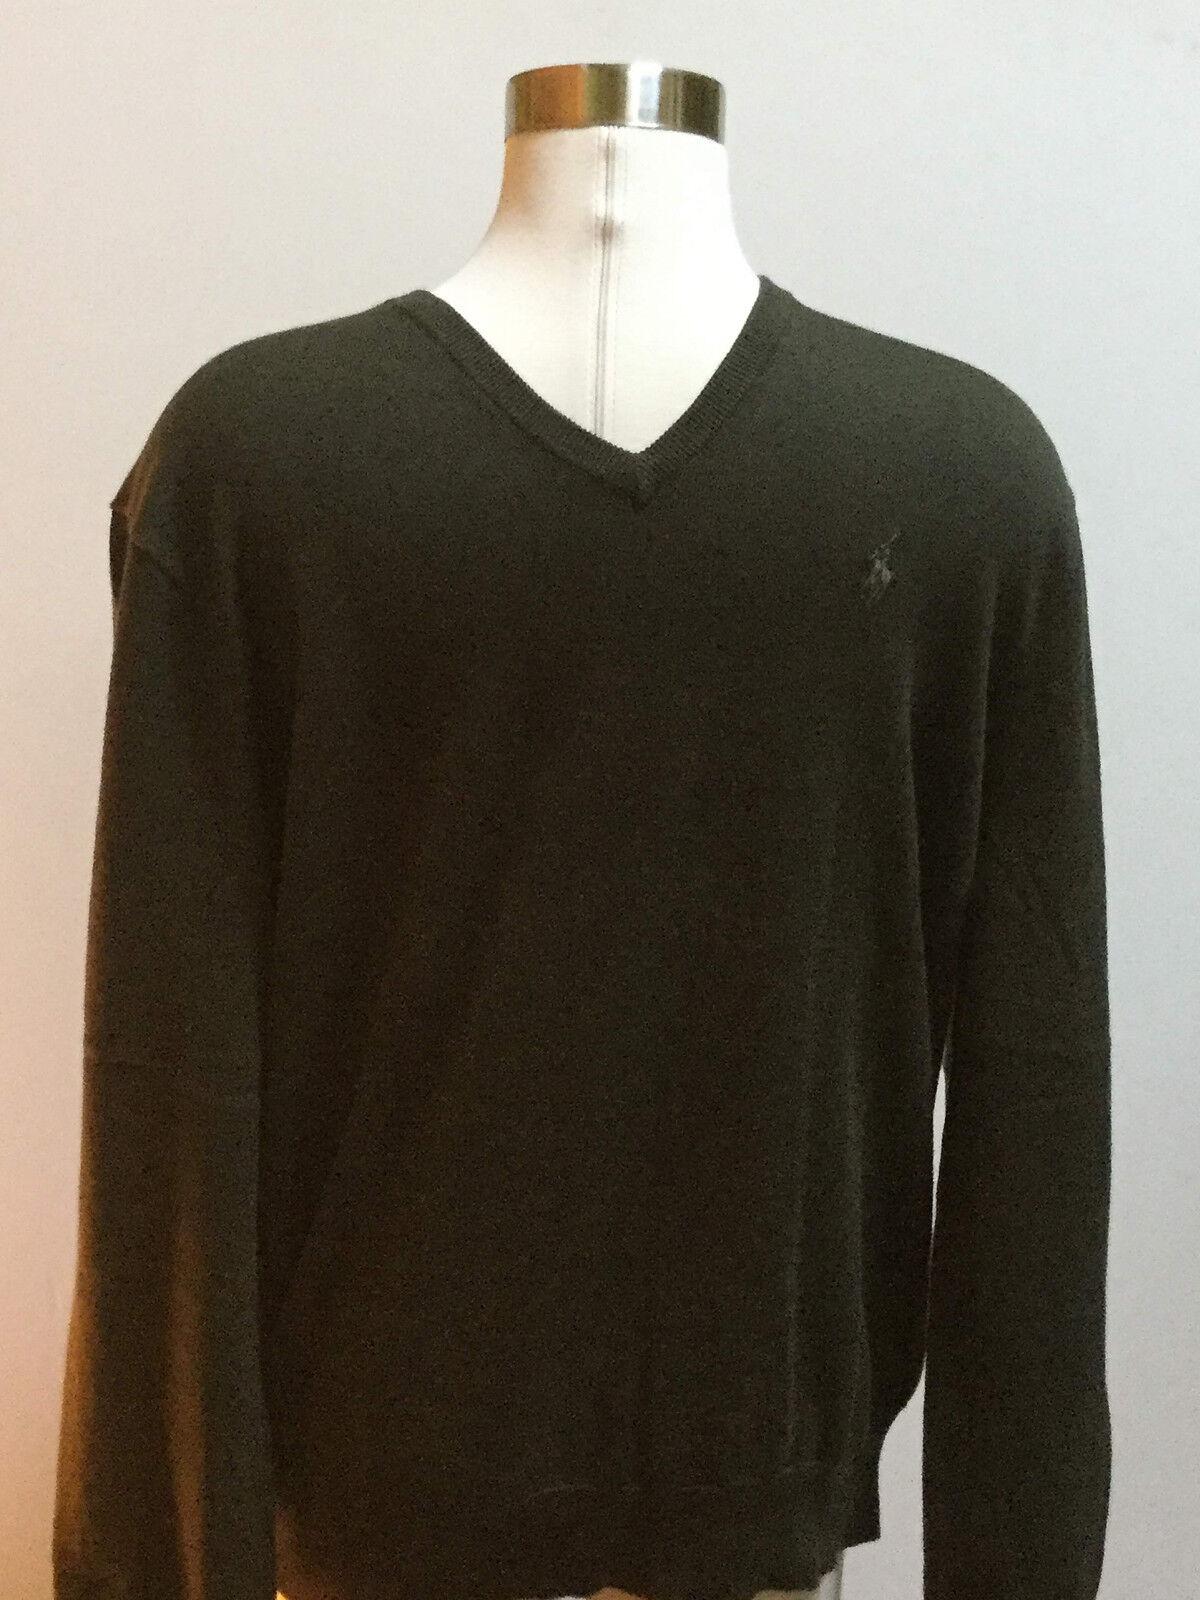 Polo Ralph Lauren men pima cotton green sweater size large